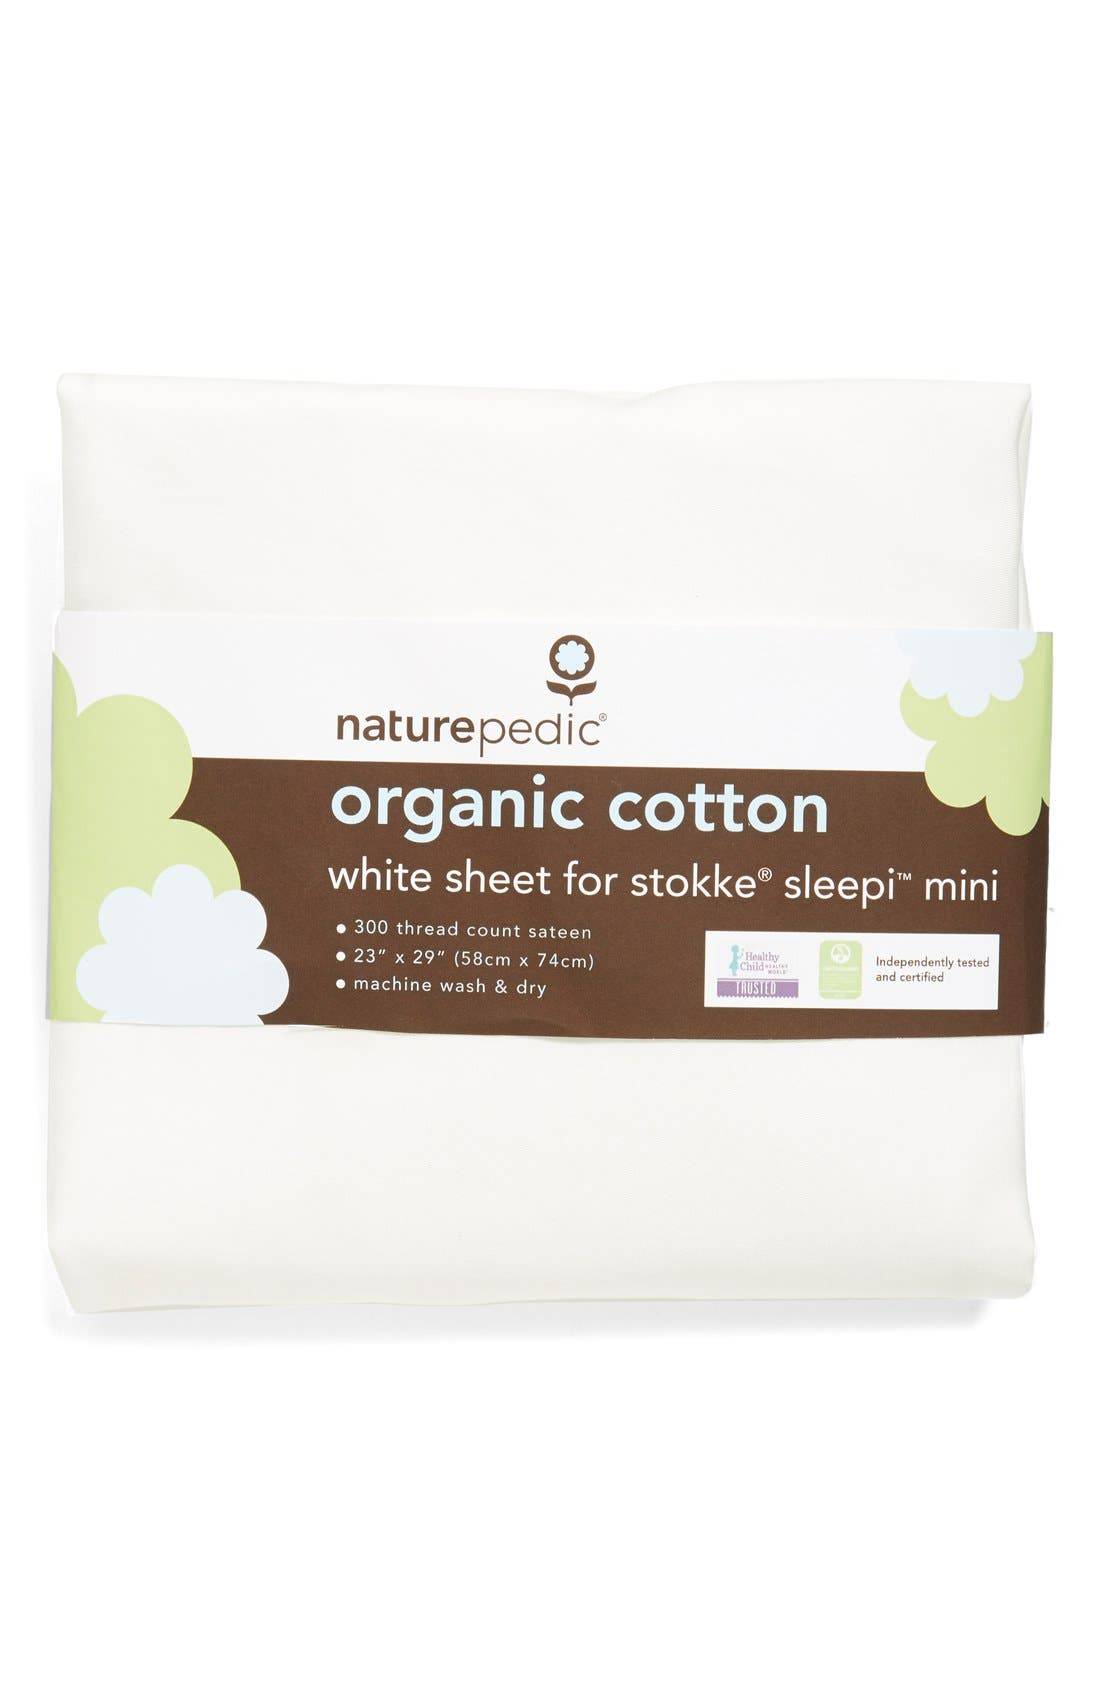 300 Thread Count Organic Cotton Oval Crib Sheet for Stokke Sleepi Mini,                             Main thumbnail 1, color,                             WHITE